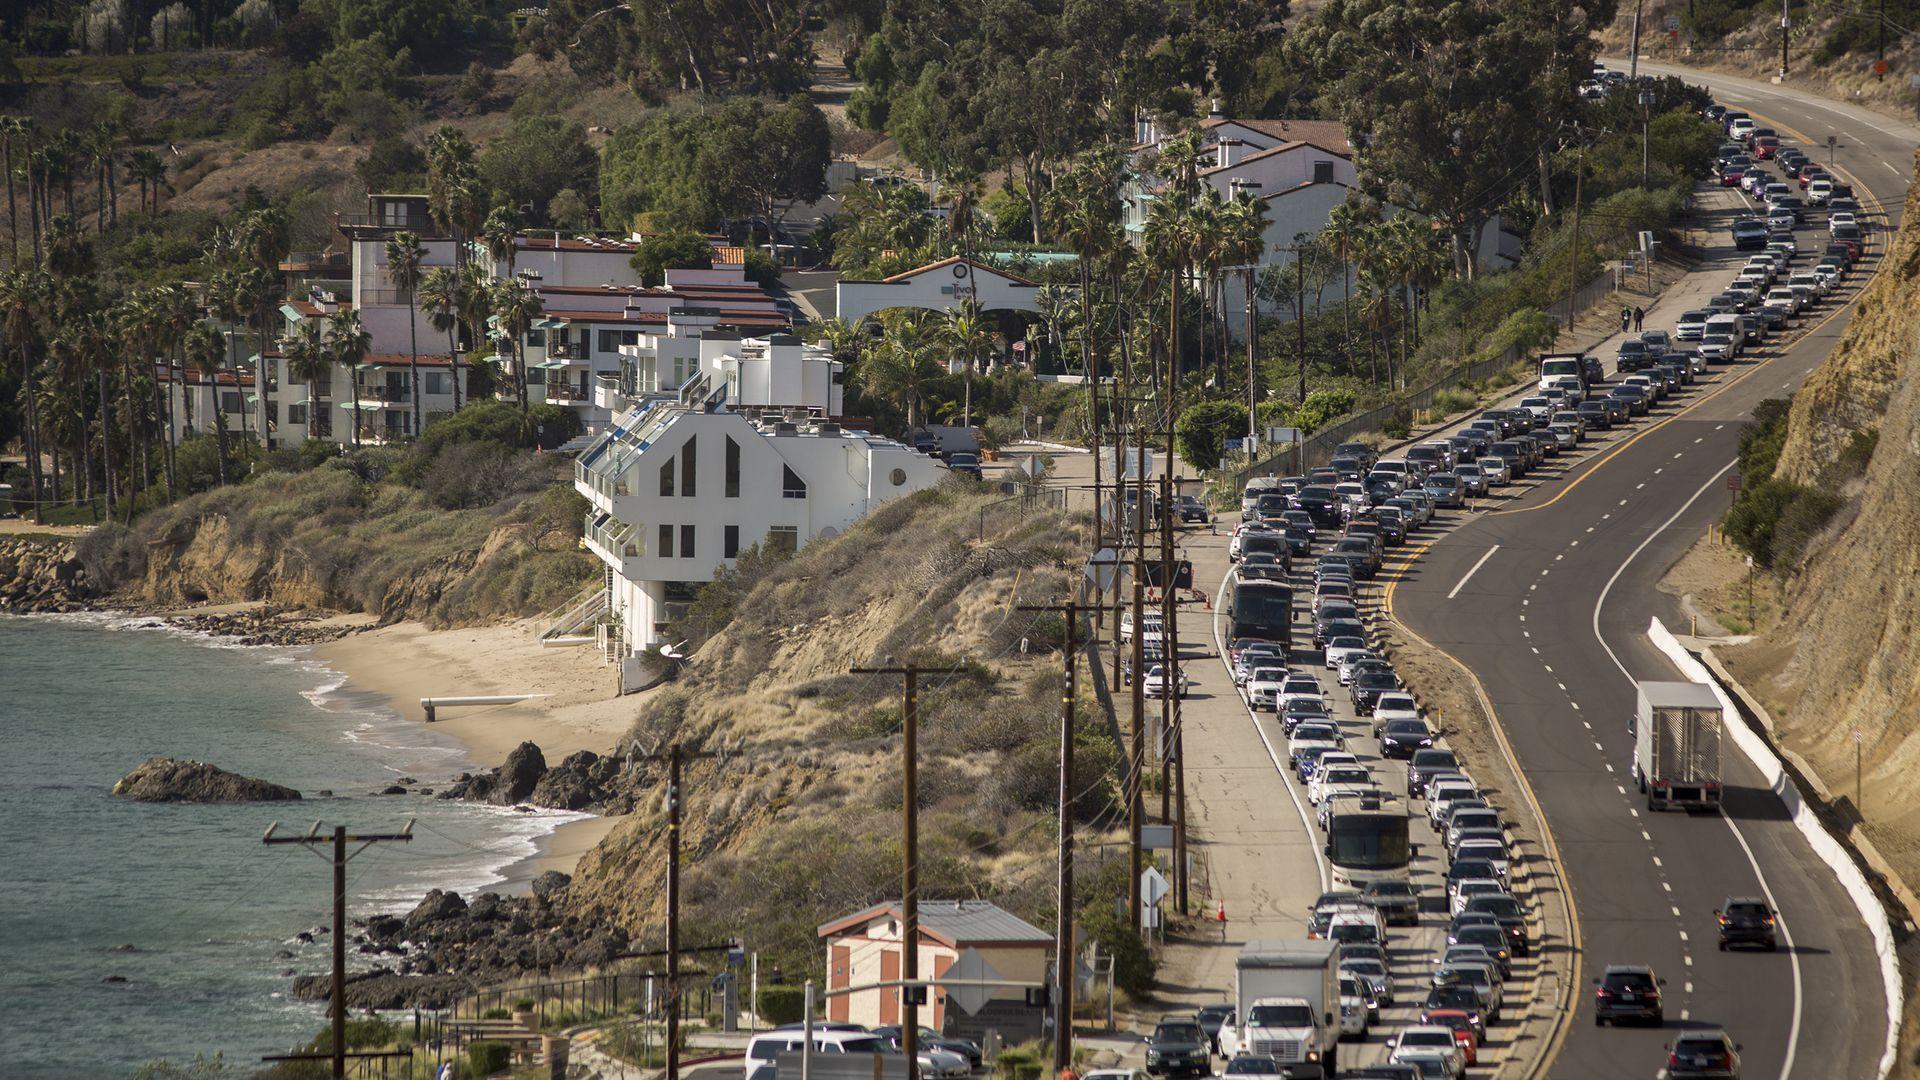 Traffic jams in California